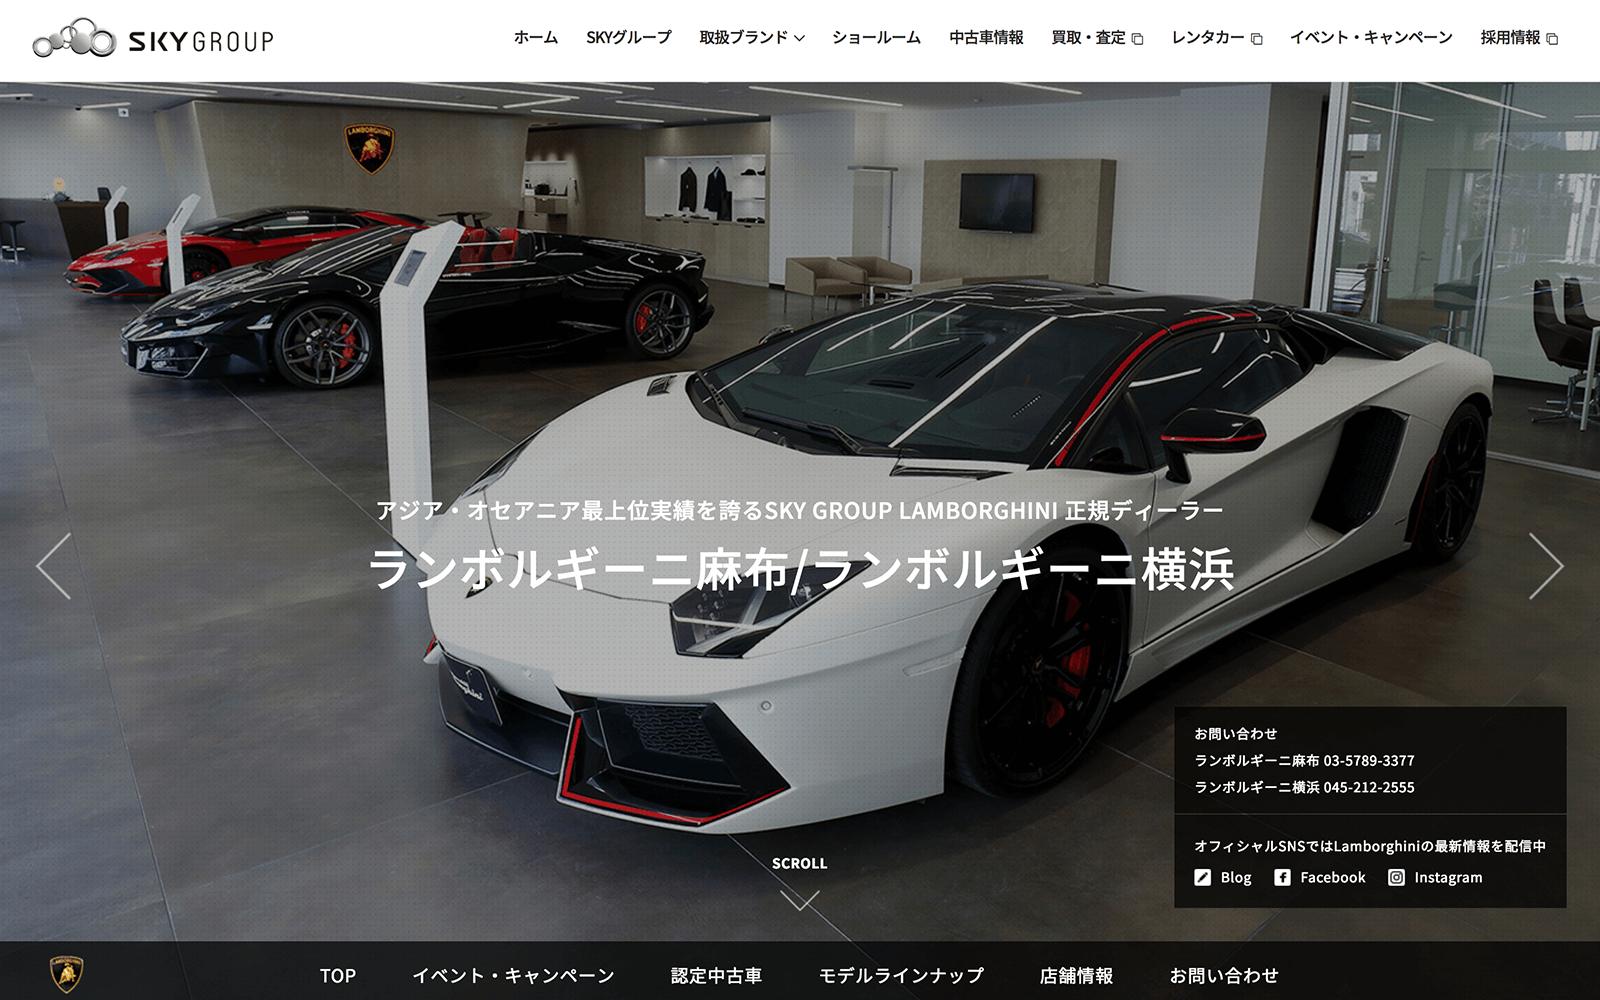 SKY GROUP「ランボルギーニ」 WEBページ